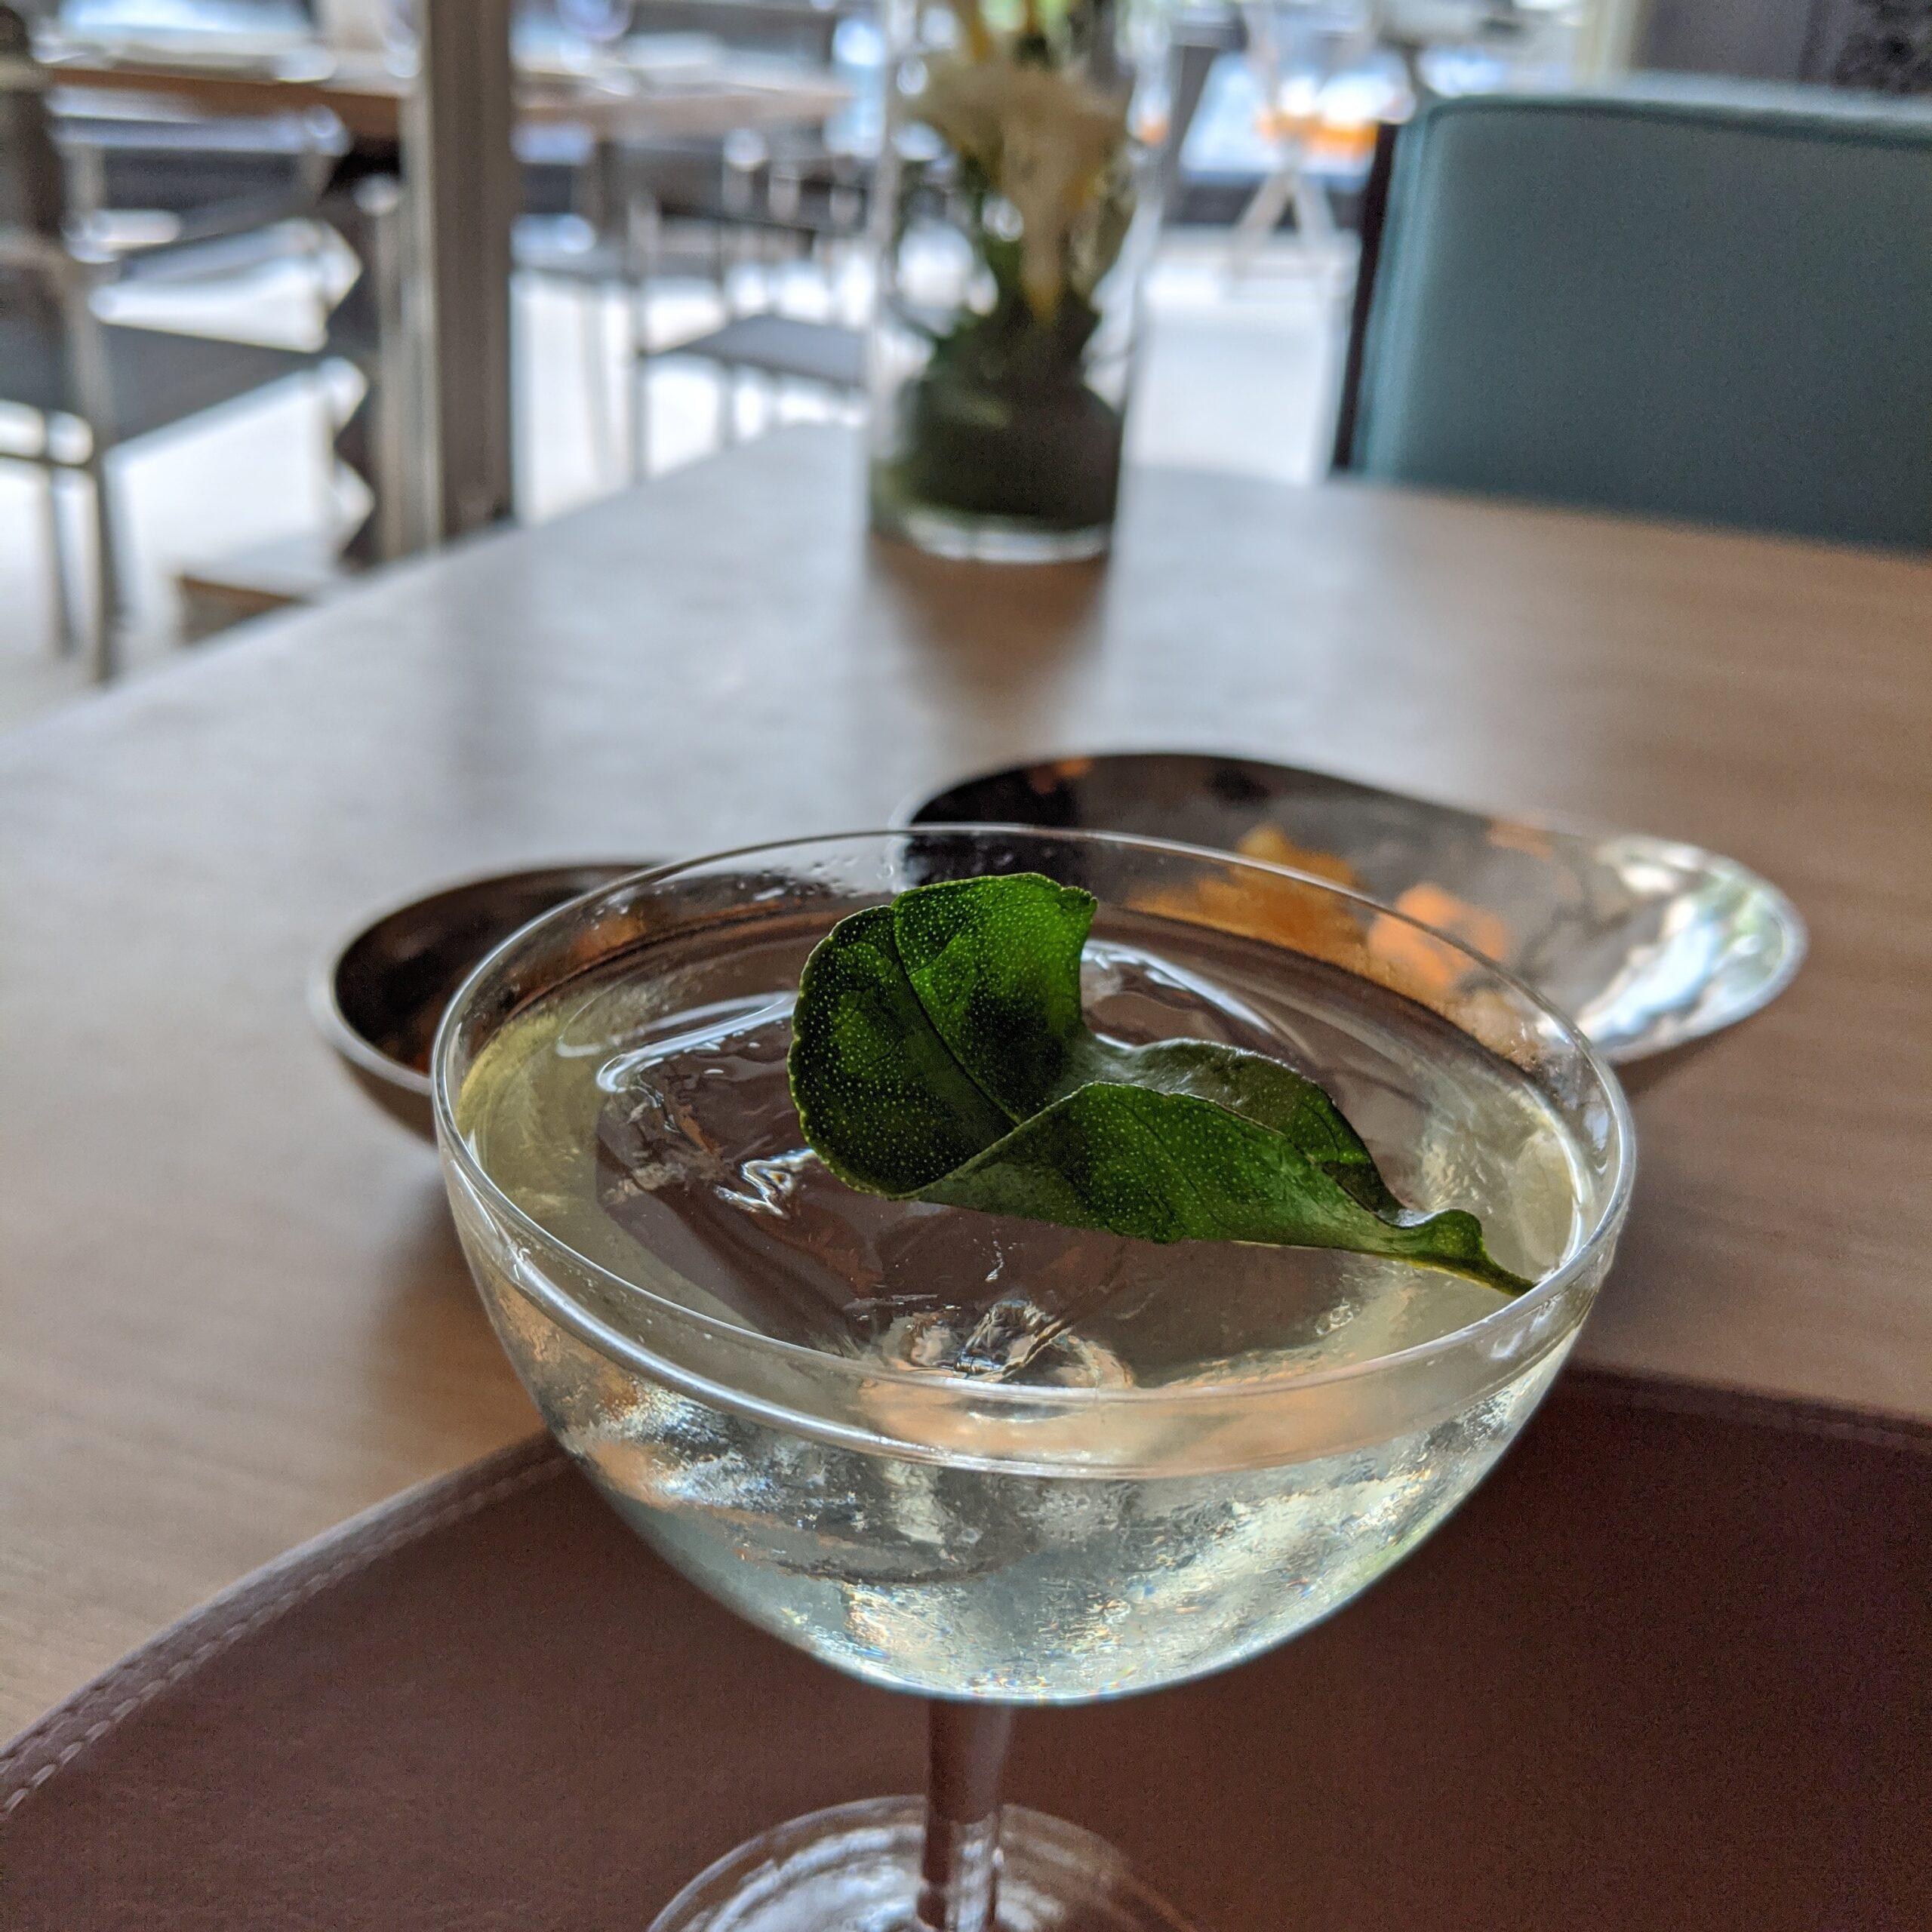 mandarin oriental singapore dolce vita welcome drink the elixir